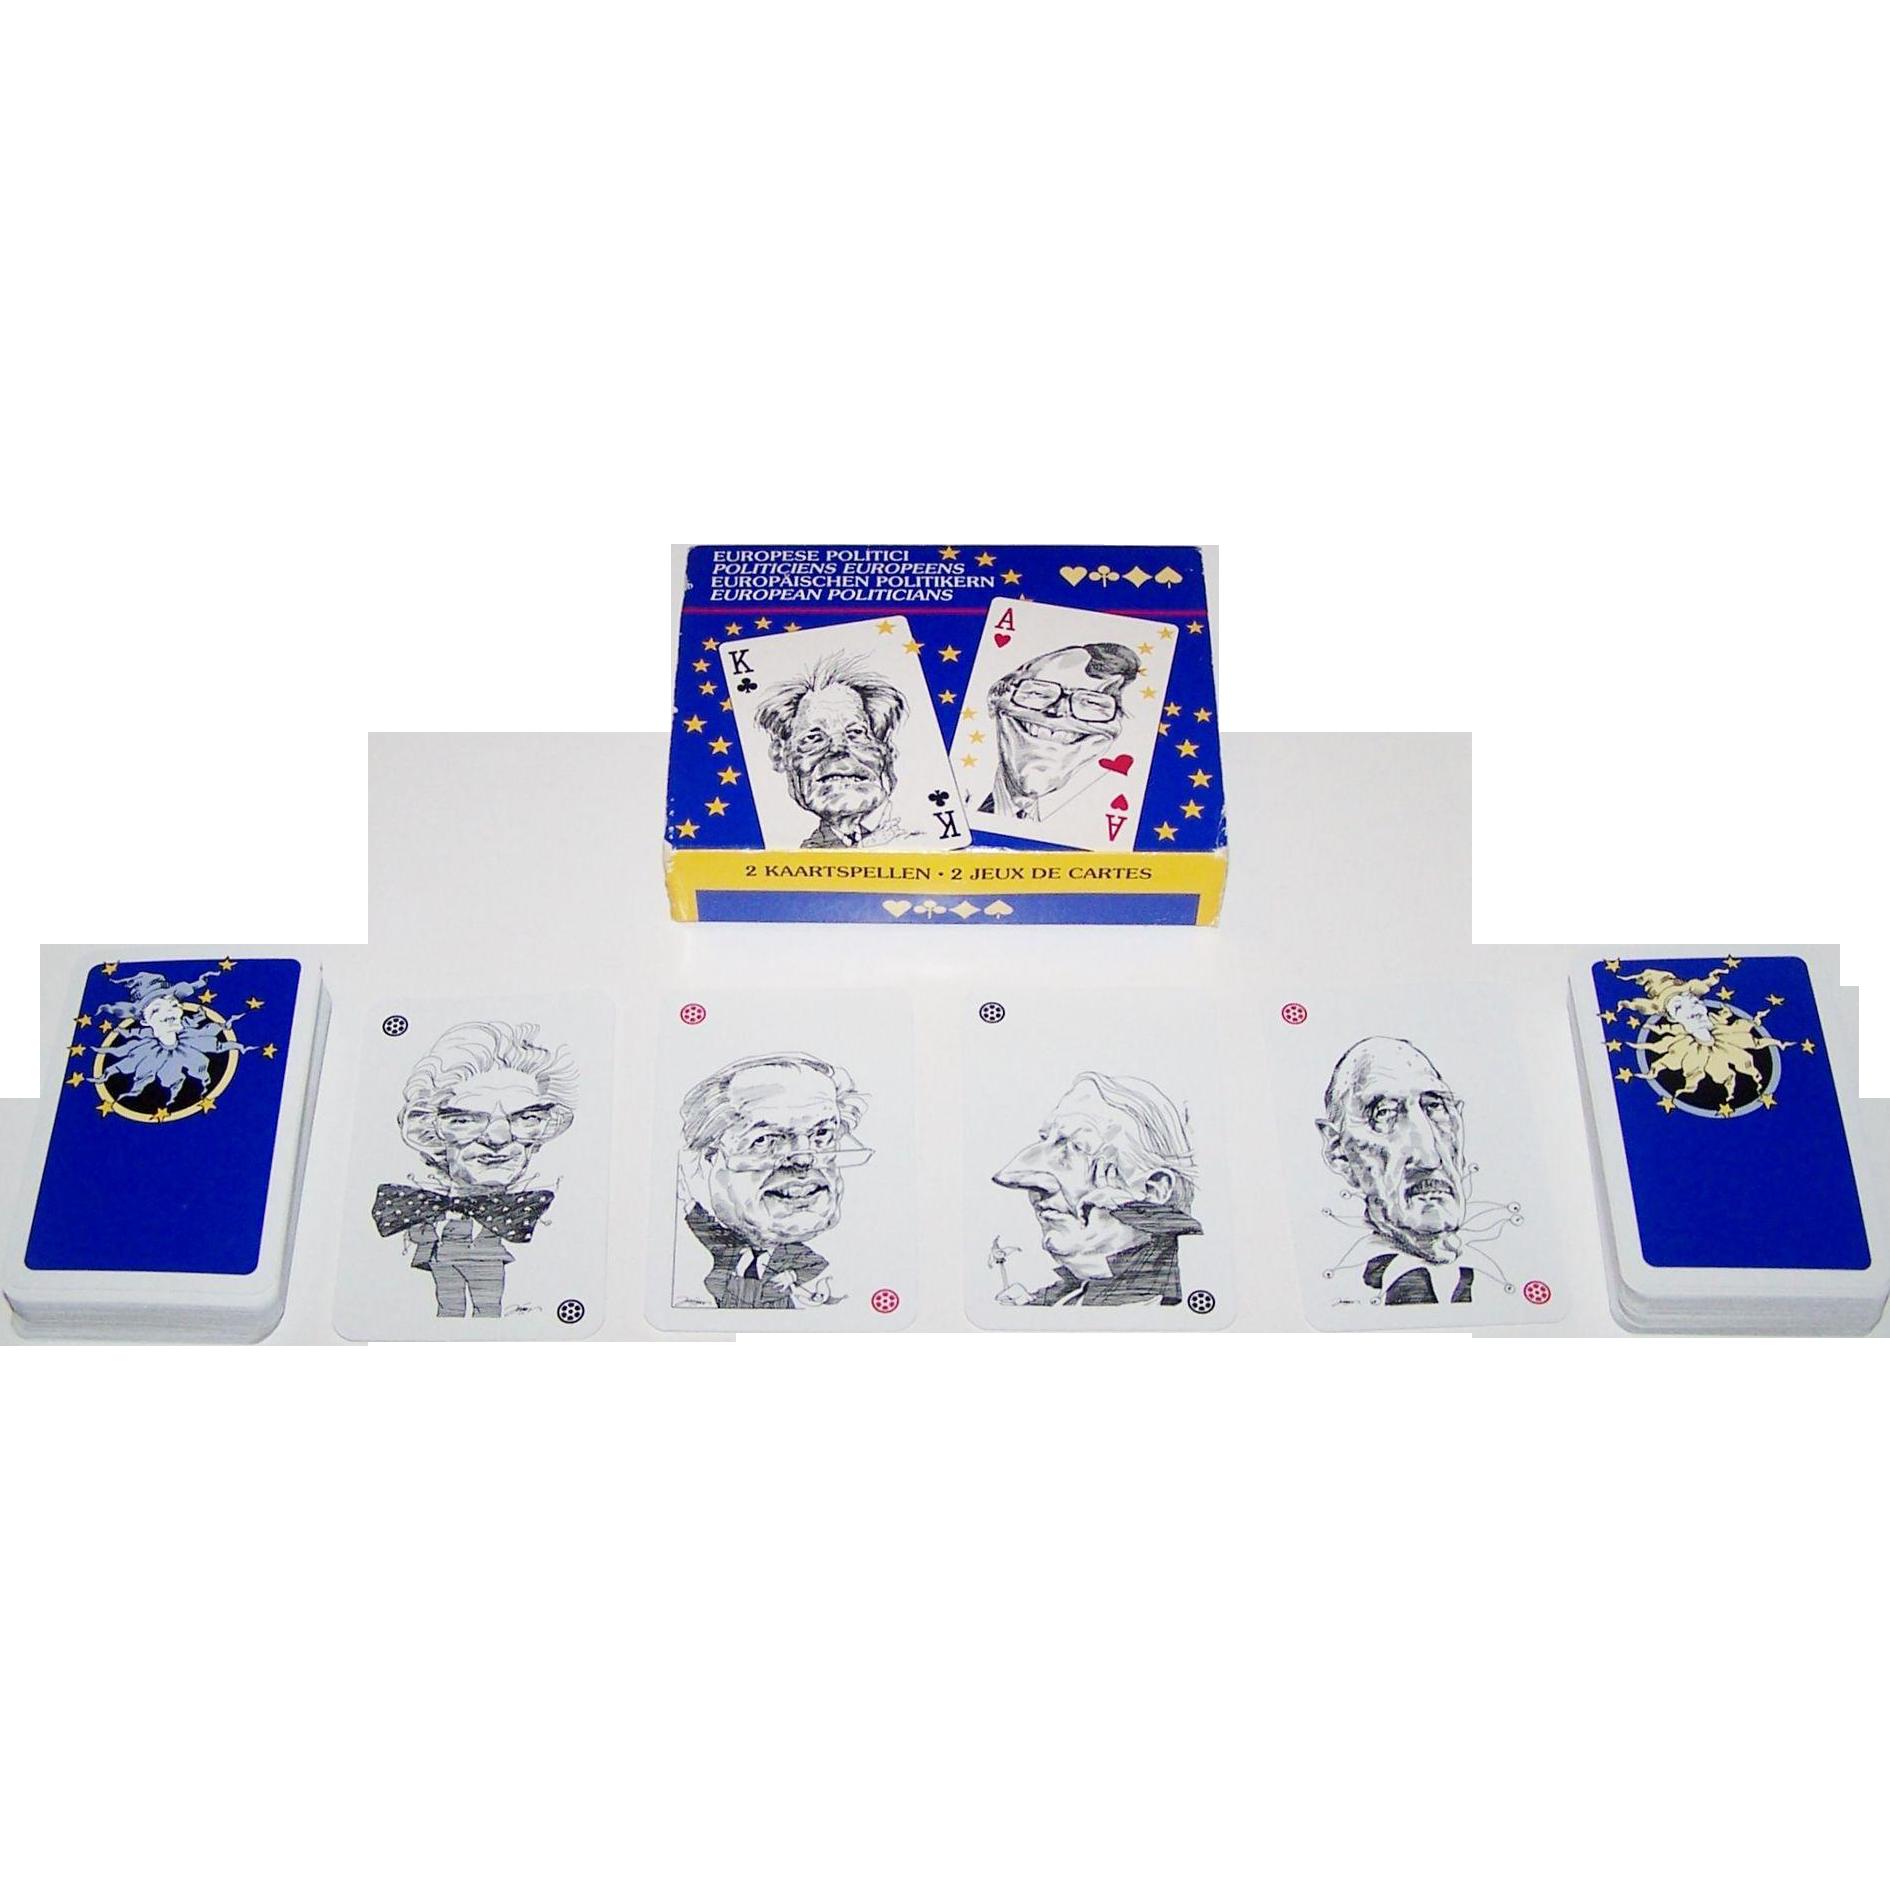 "Double Deck Carta Mundi ""European Politicians"" Playing Cards, Nationaal Museum van de Speelkaart (Turnhout), Junius Designs, c.1991"